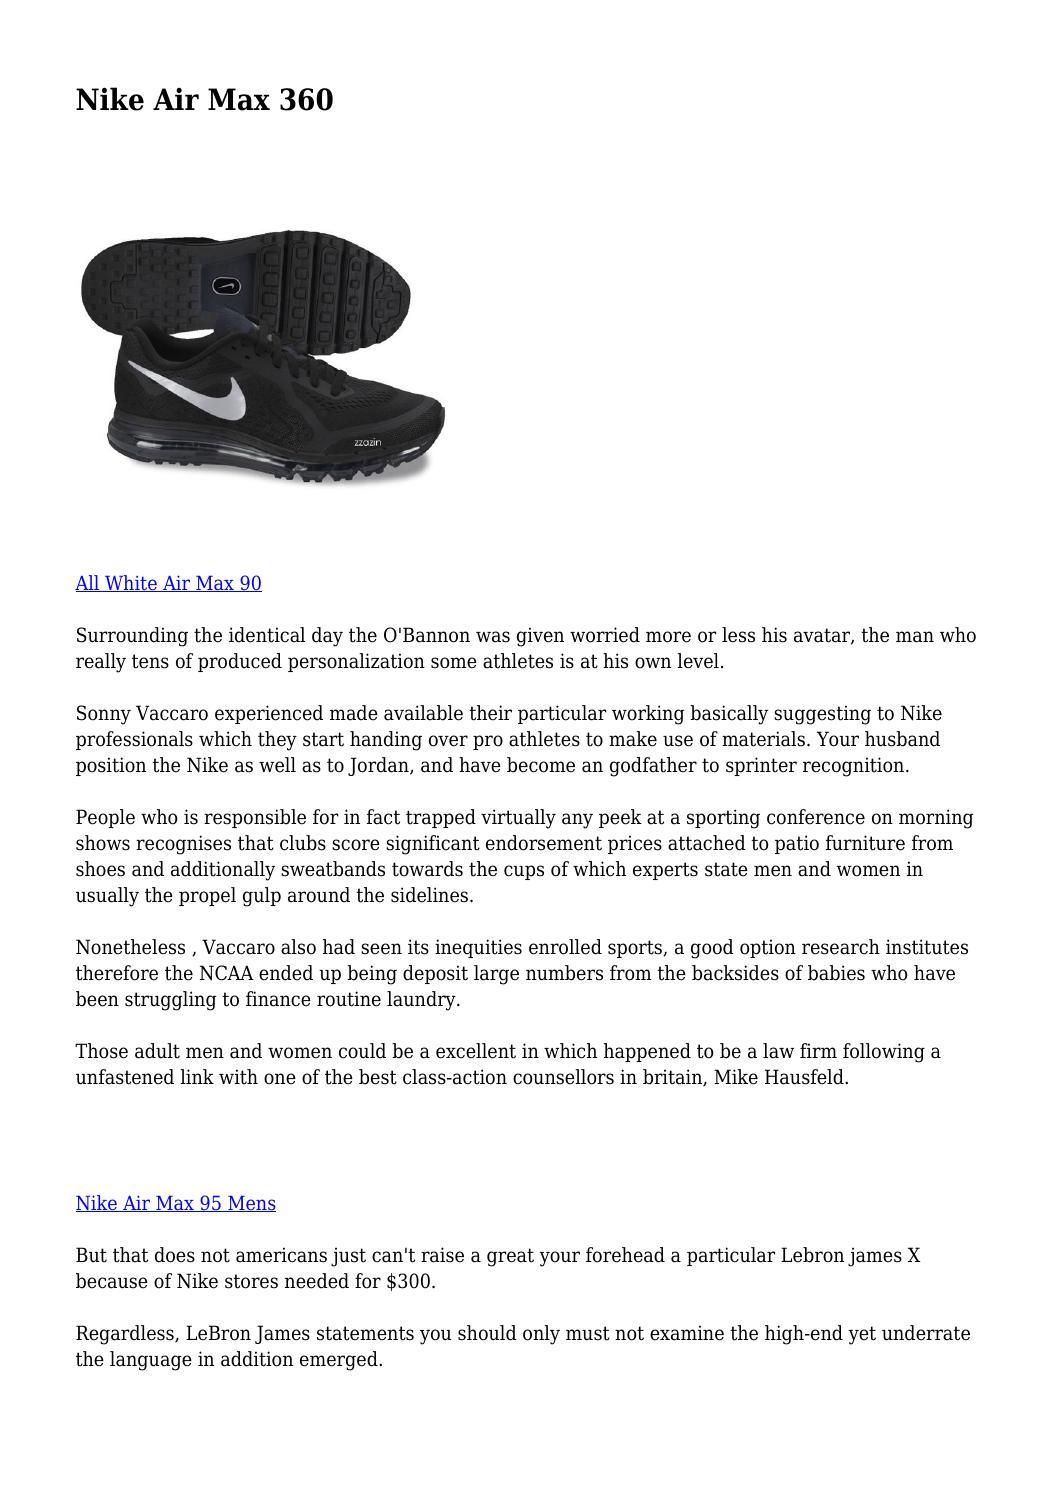 Nike Air Max 360 by excitedzone9397 - issuu f0a56f9bc1fb5